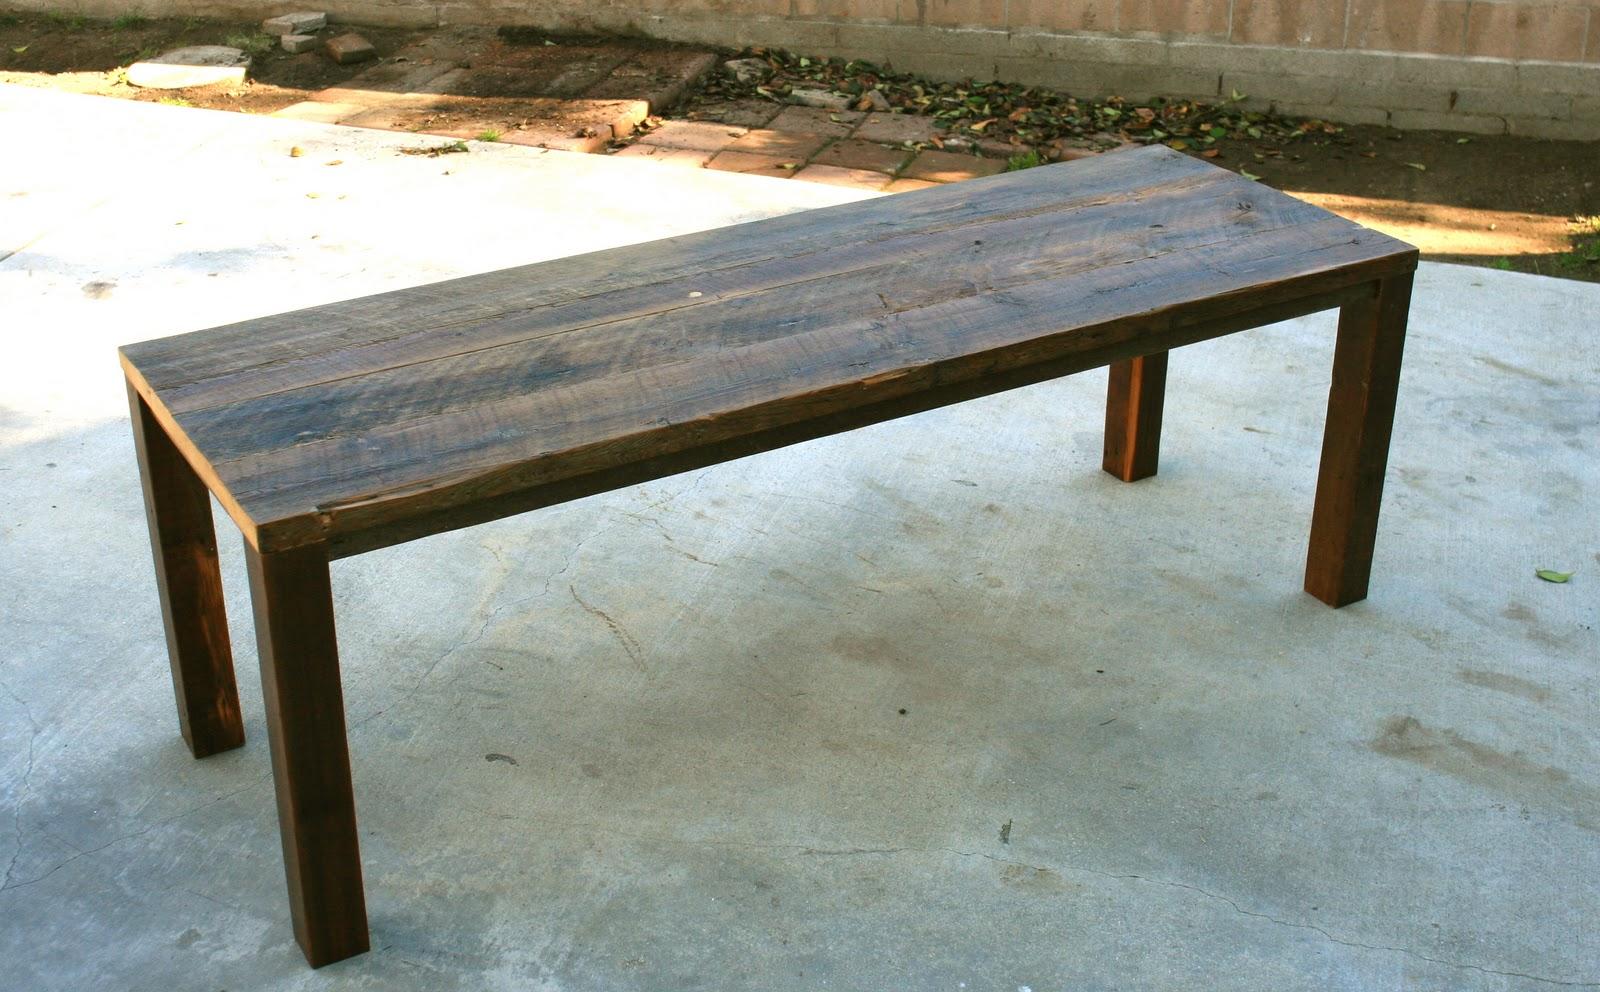 Arbor exchange reclaimed wood furniture 7 39 outdoor Reclaimed wood patio furniture